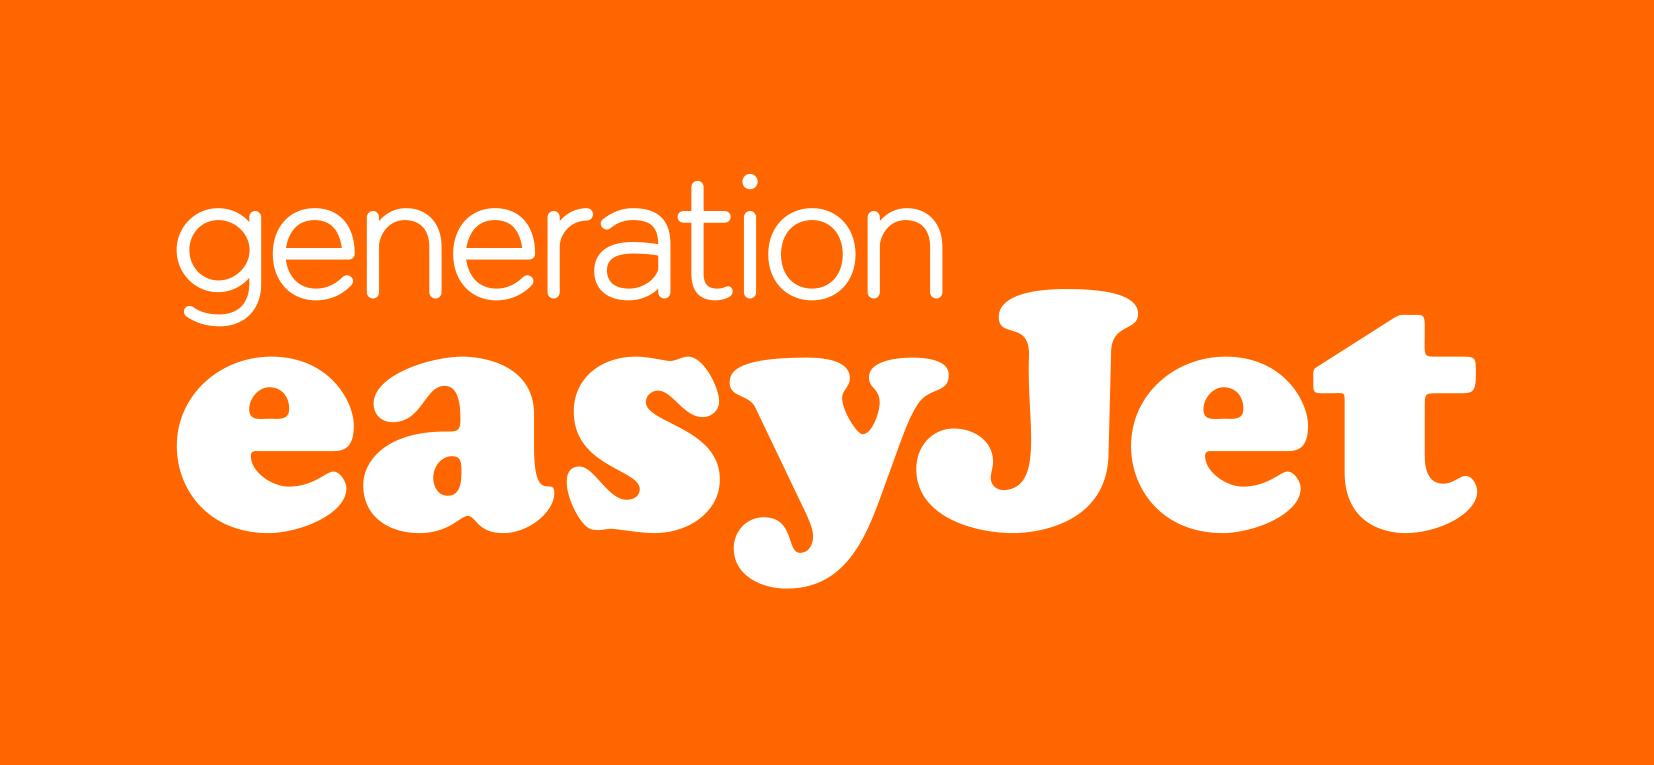 easyJet-generation-orange-RGB PlusPng pluspng.com - Easyjet PNG - Easyjet Logo Vector PNG